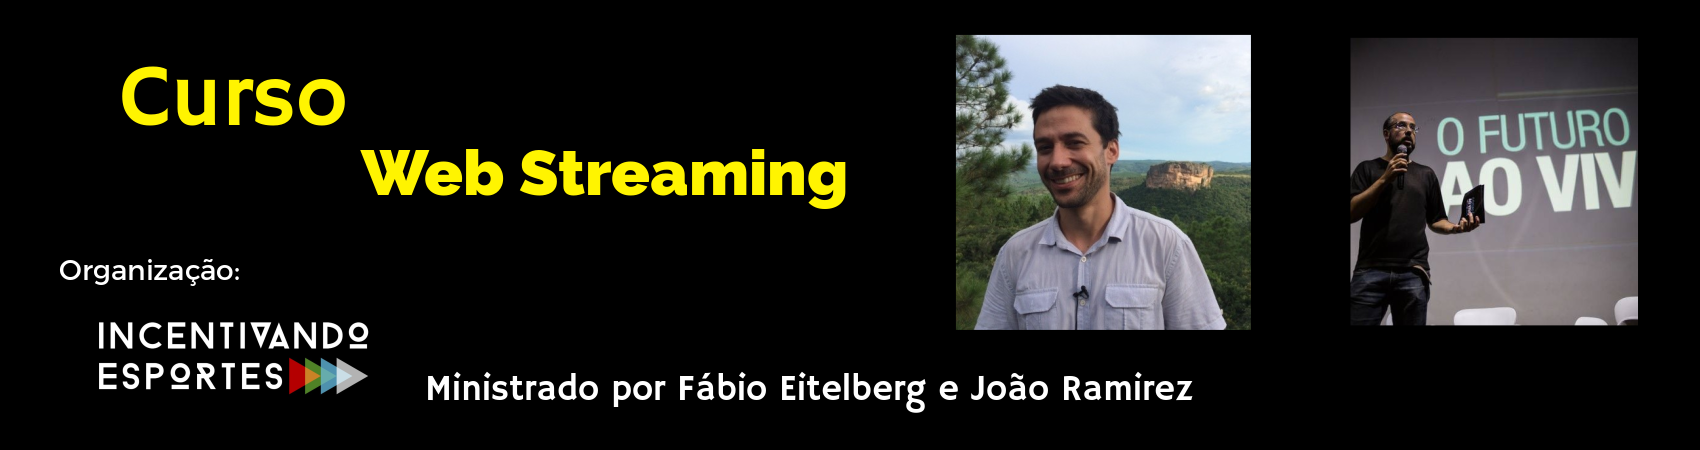 Curso Web Streaming